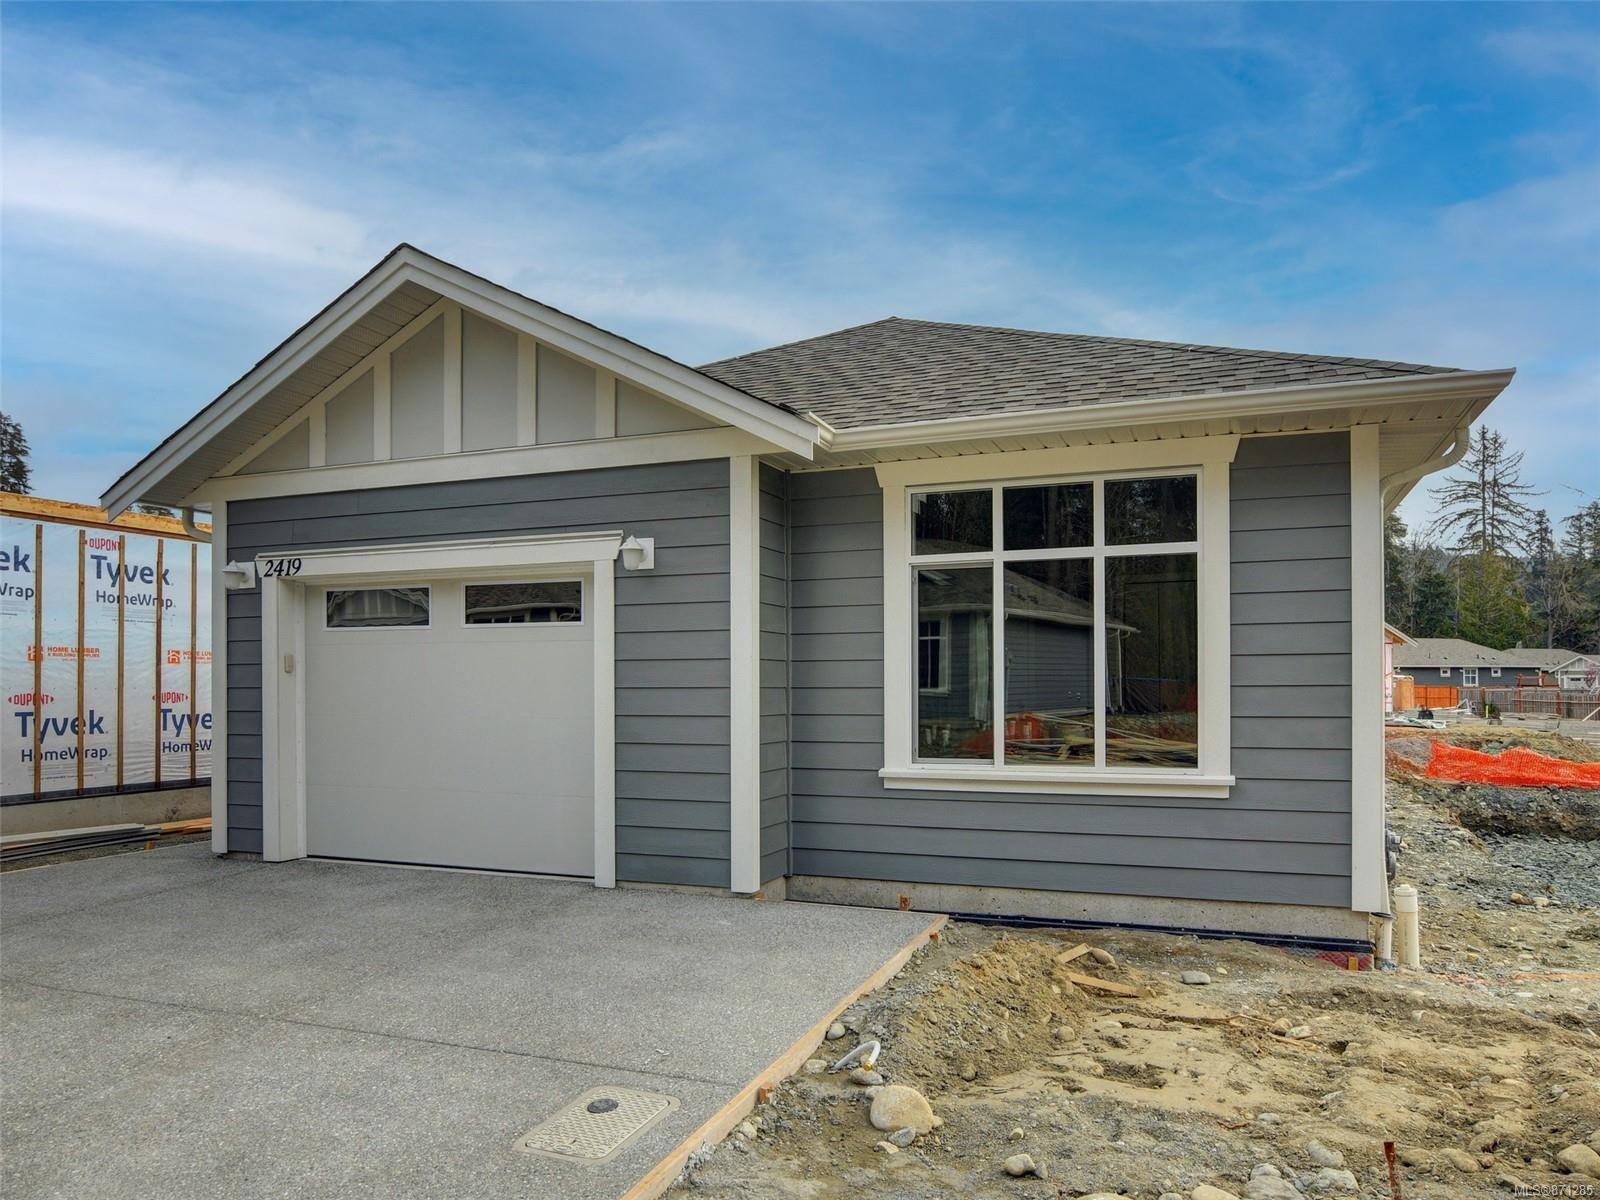 Main Photo: 2419 Fern Way in : Sk Sunriver House for sale (Sooke)  : MLS®# 871285